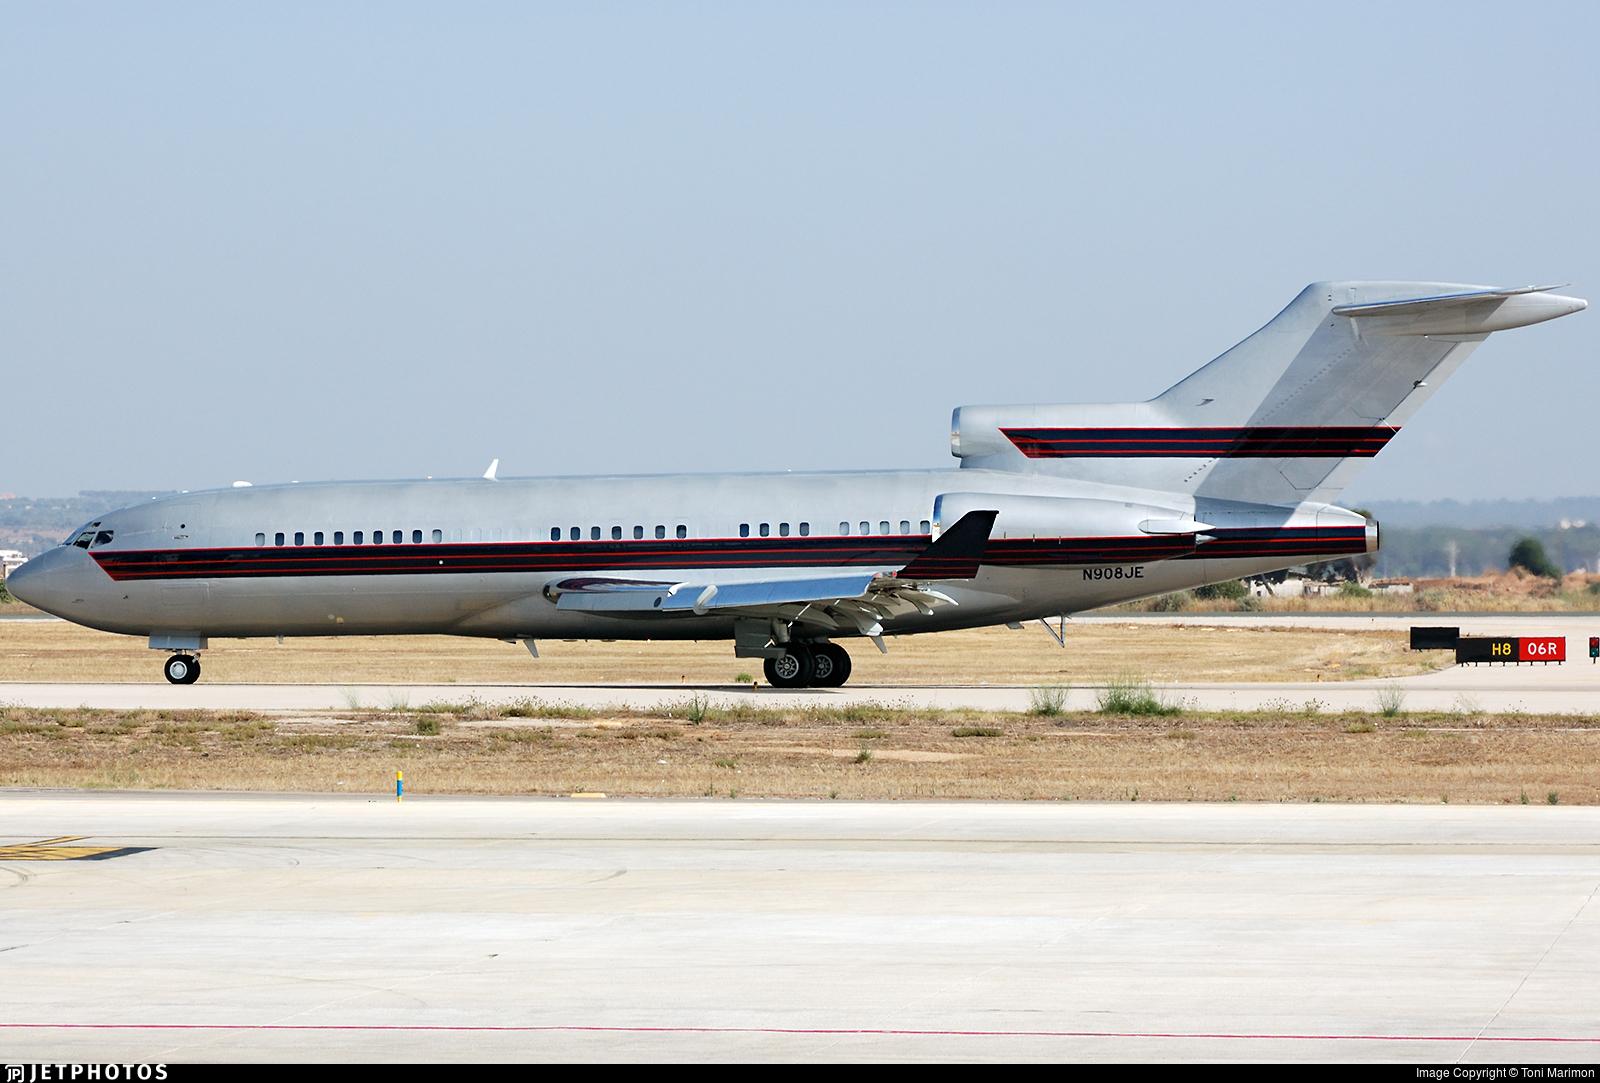 N908JE - Boeing 727-31 - Private